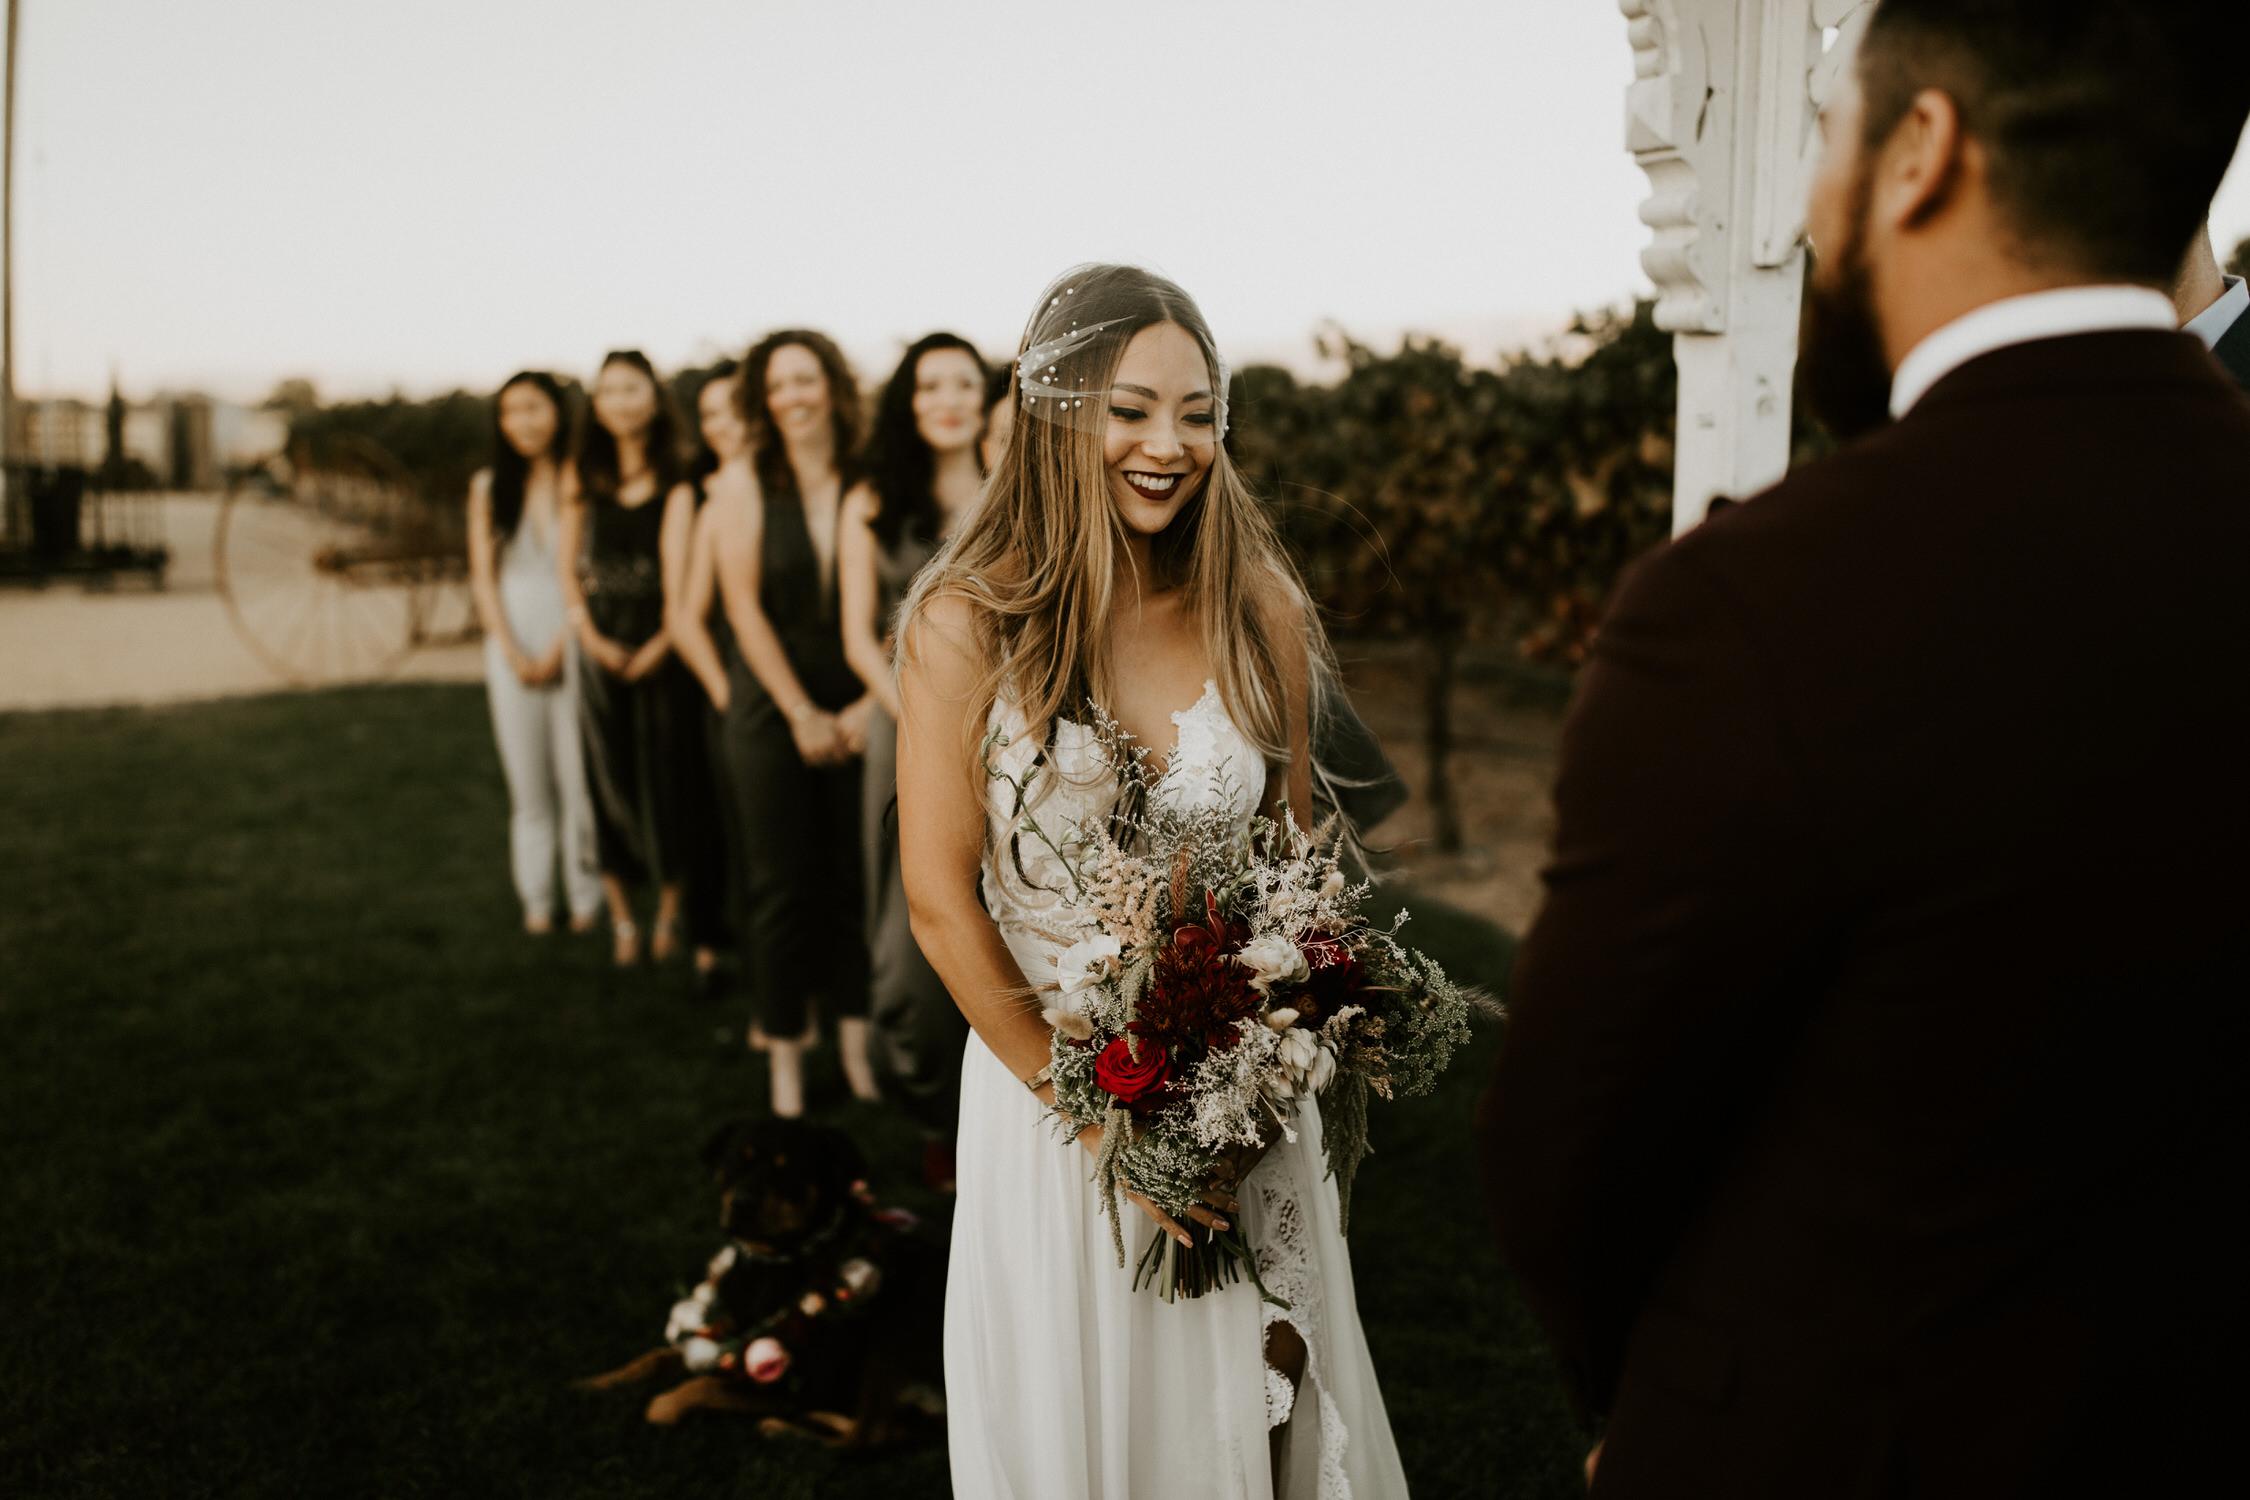 couple-intimate-wedding-northern-california-118.jpg